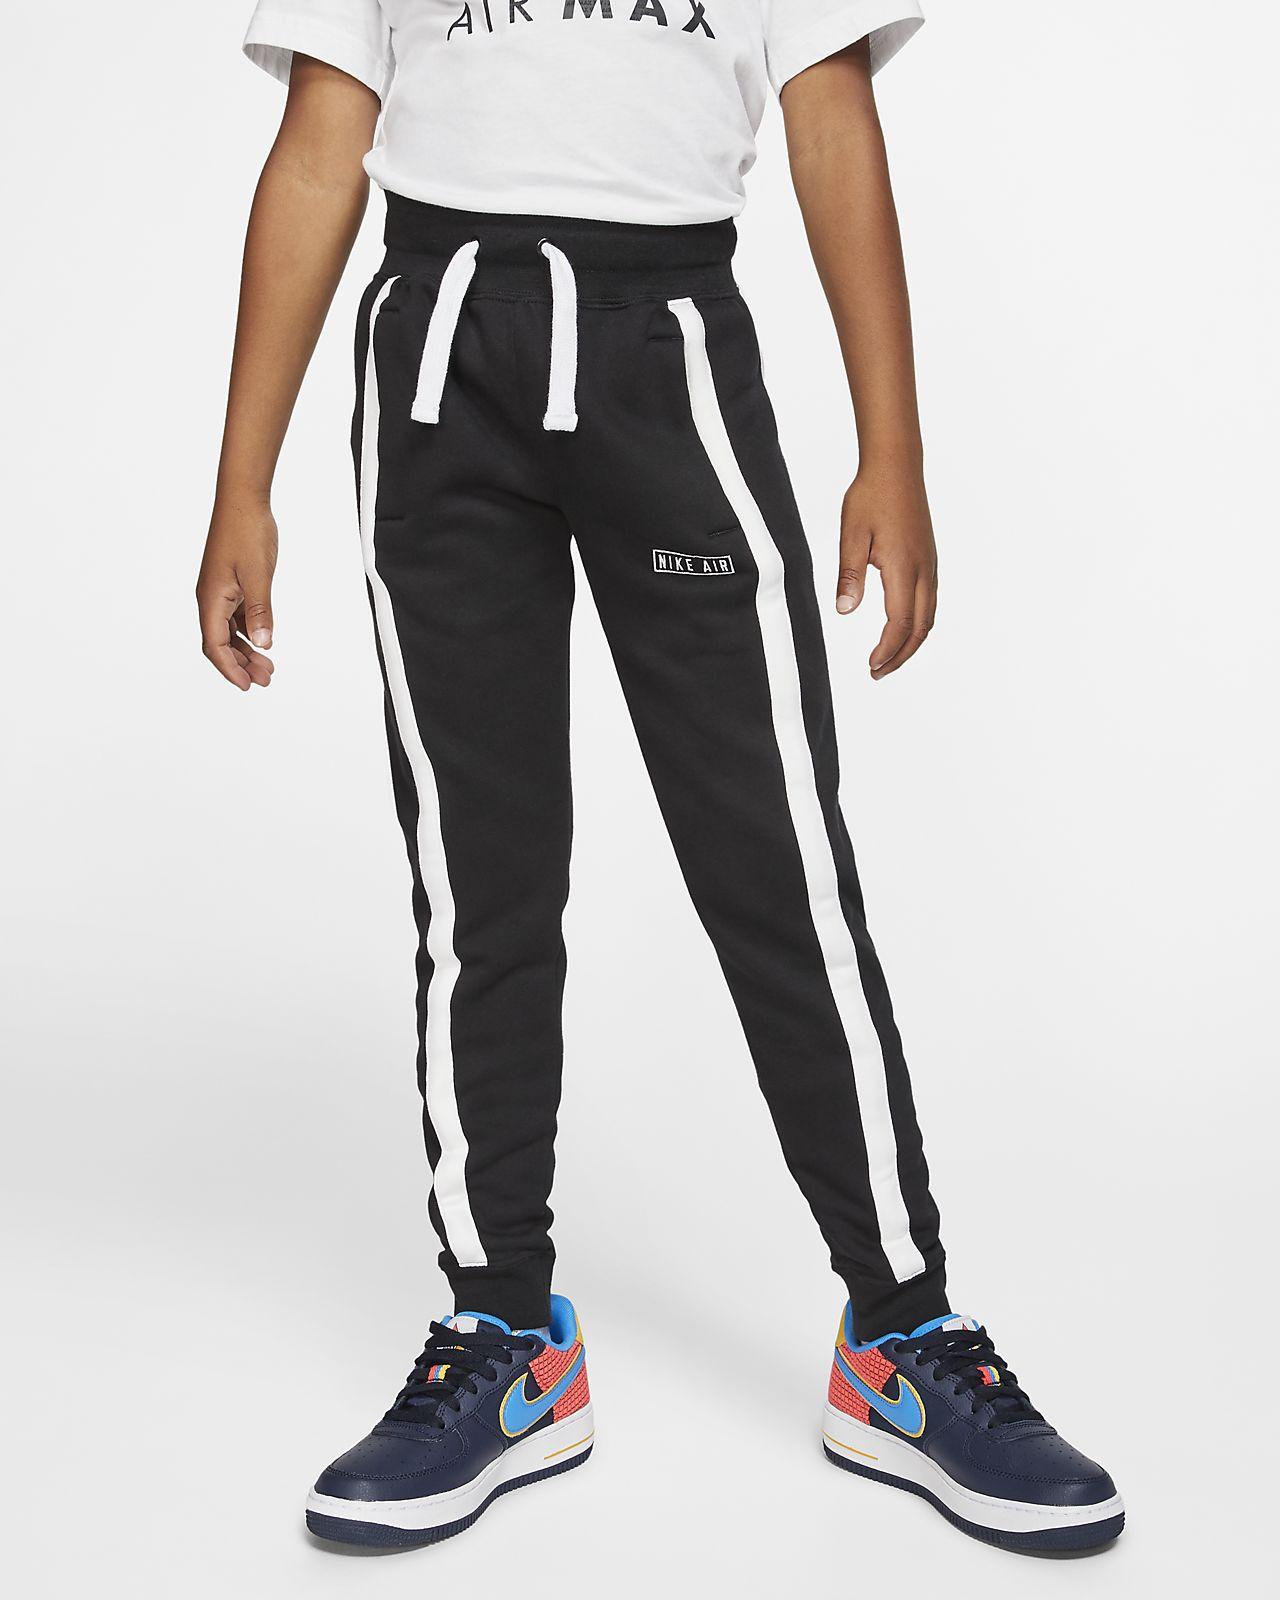 Pantaloni Nike Sportswear Uomo Gold nike bianco Sportivo